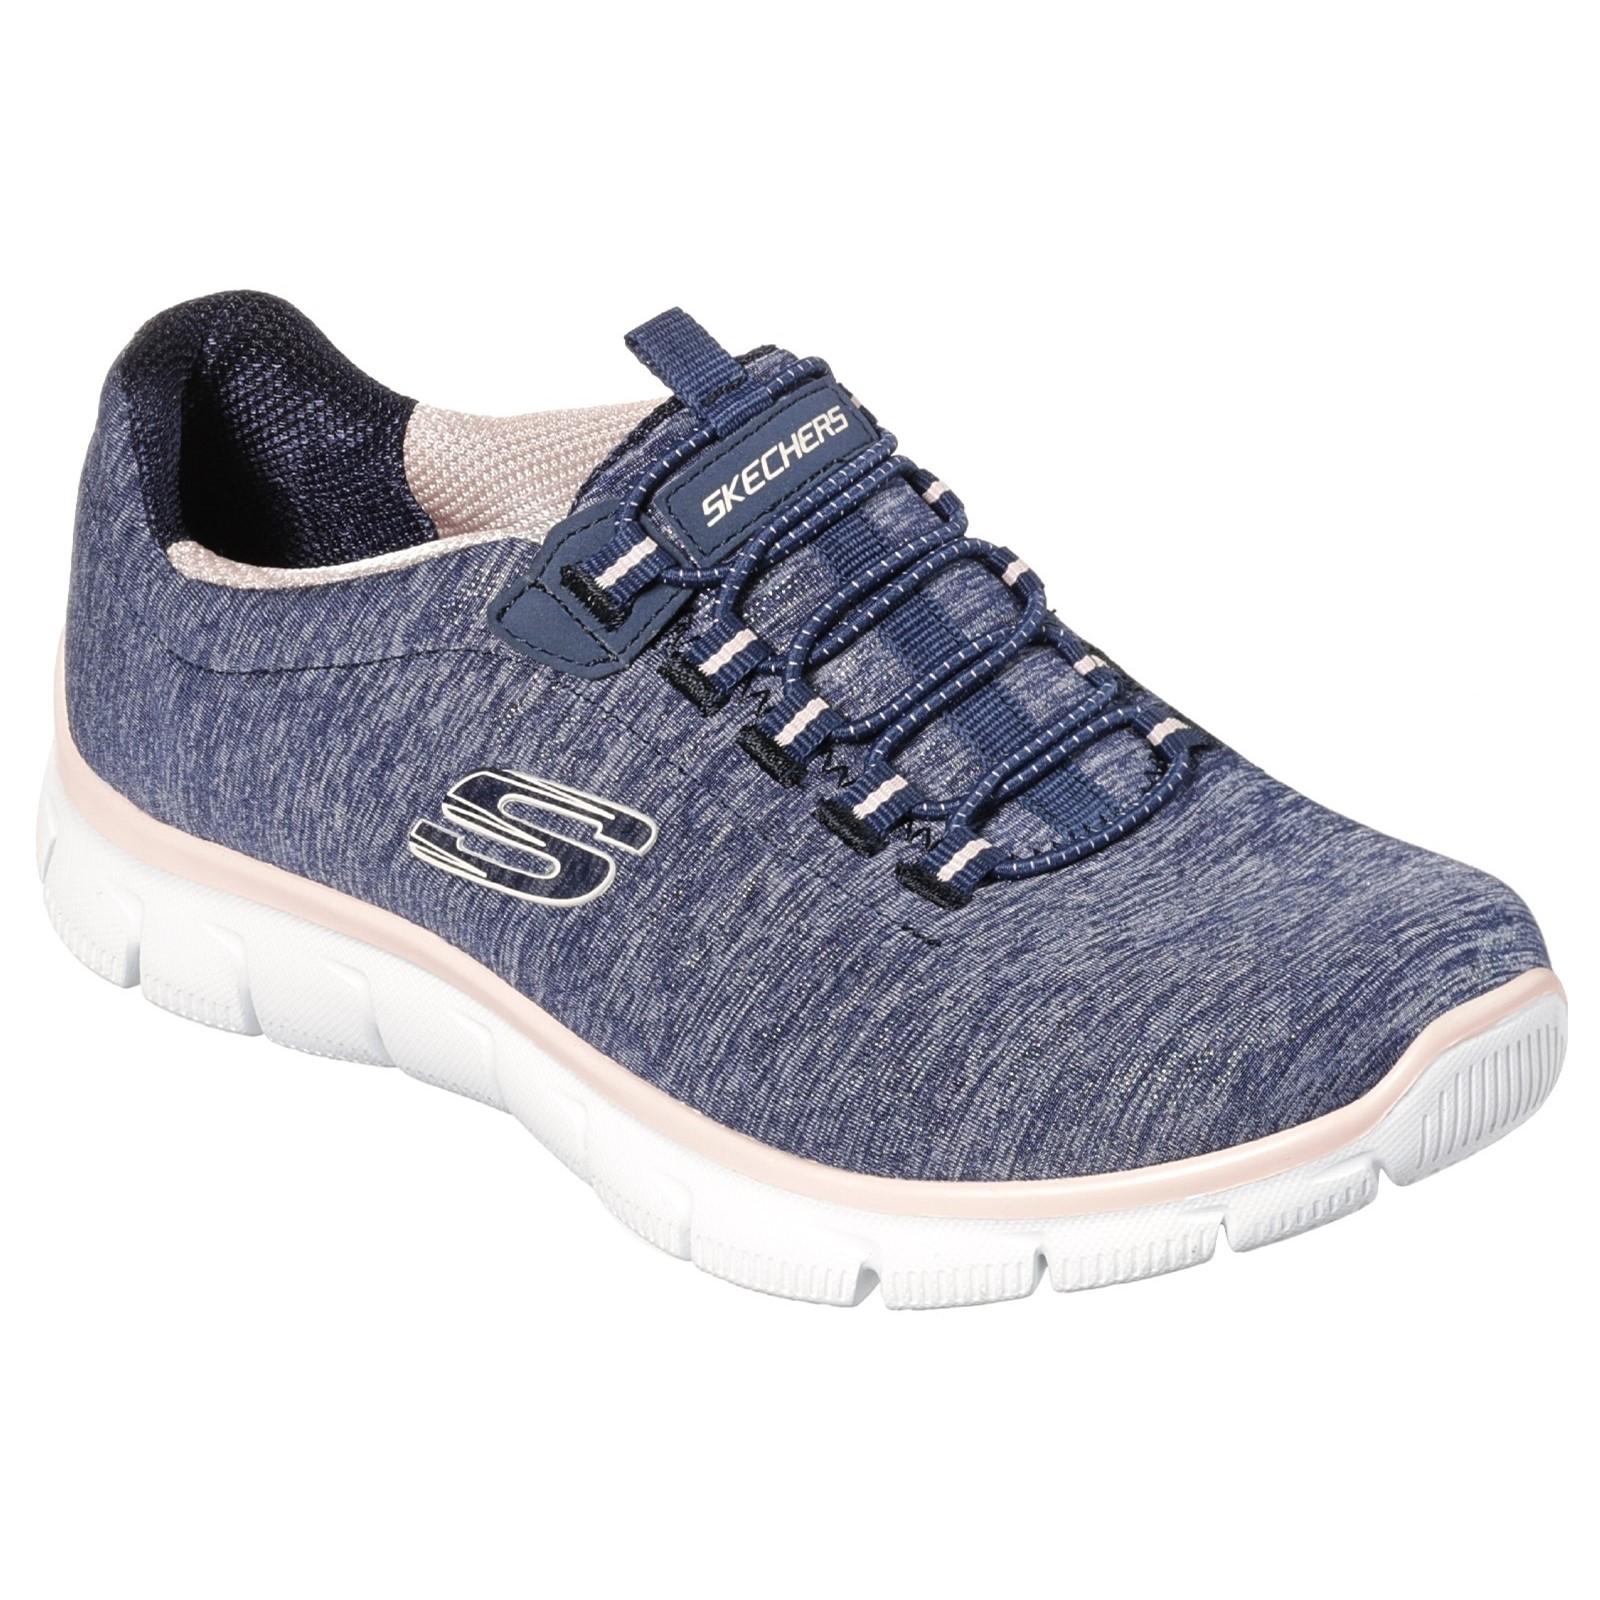 Skechers Womens Empire - See Ya Bungee Slip On Air Cooled Memory Foam shoes